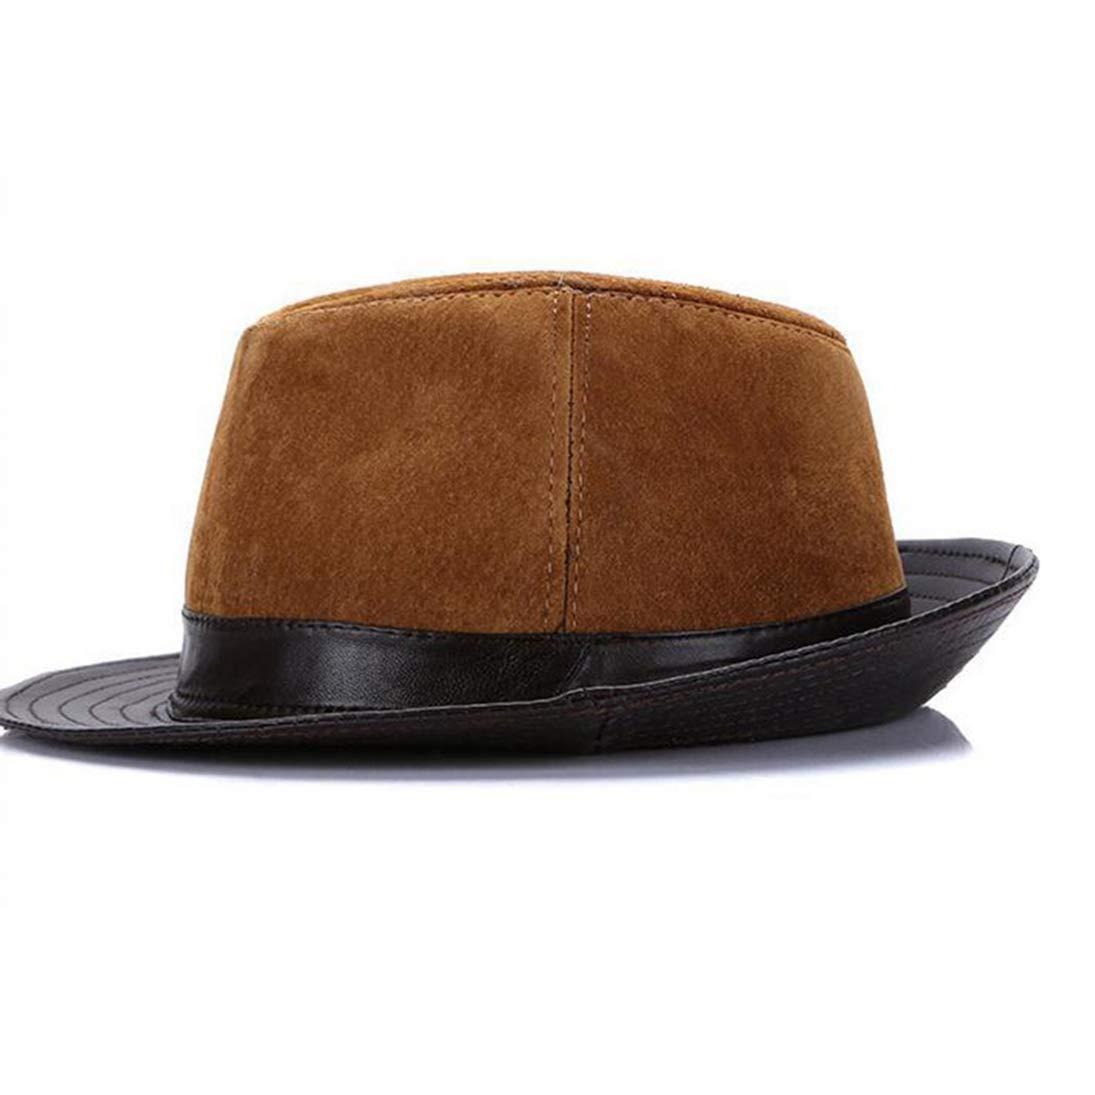 Classic Manhattan Fedora Hat Unisex Timelessly Vintage Wide Brim Leather Jazz Hat with Black Band